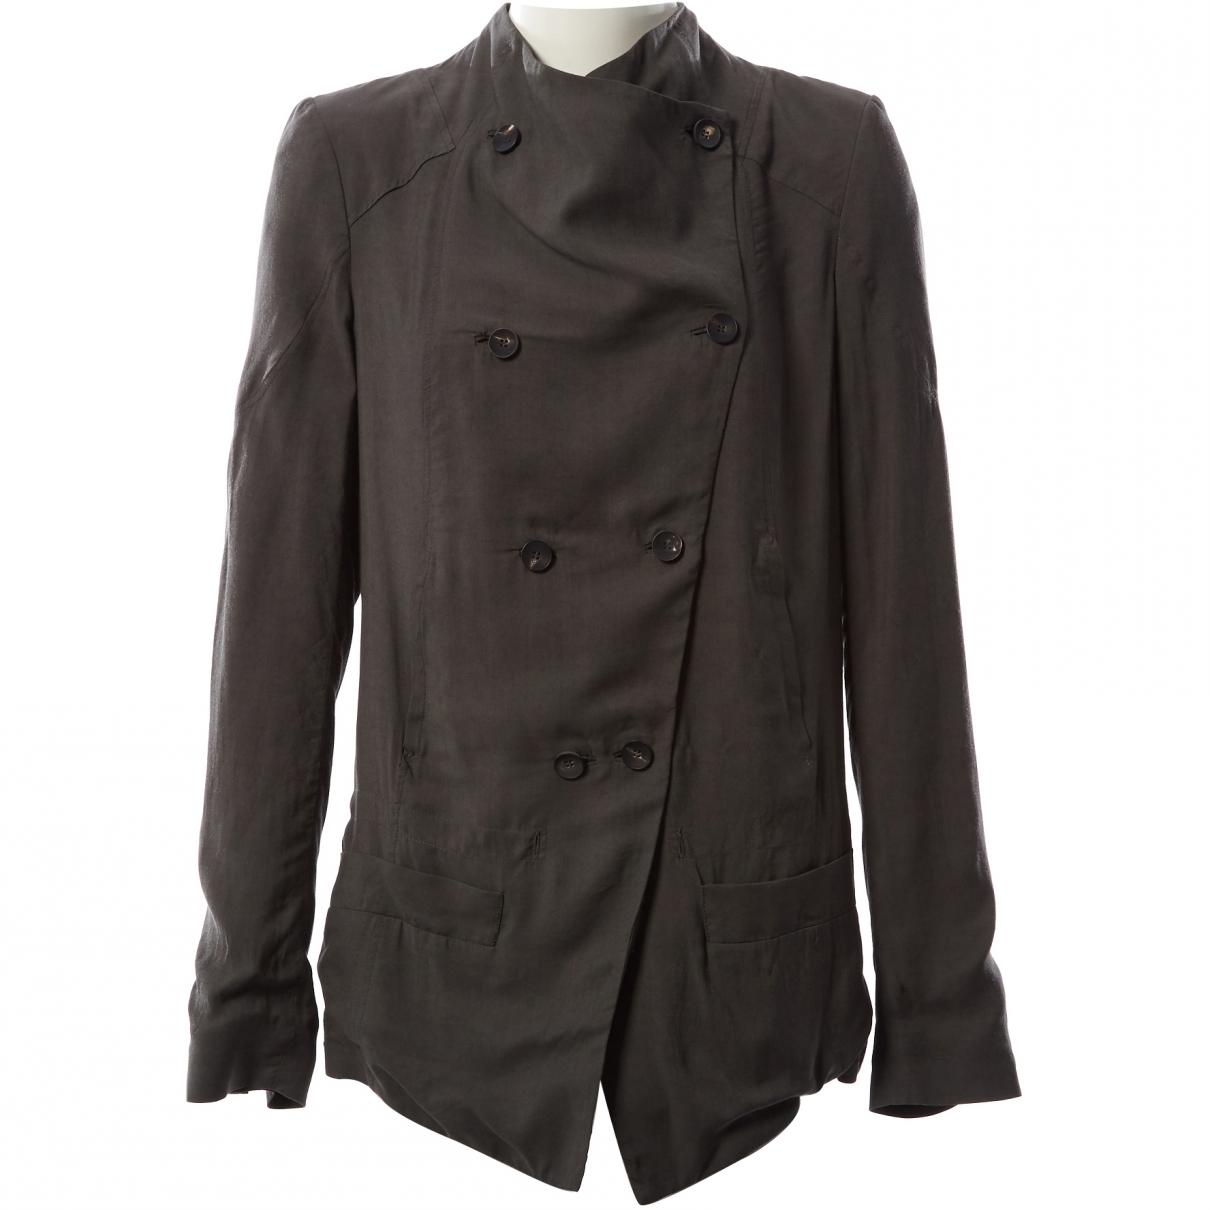 Helmut Lang \N Grey jacket for Women S International